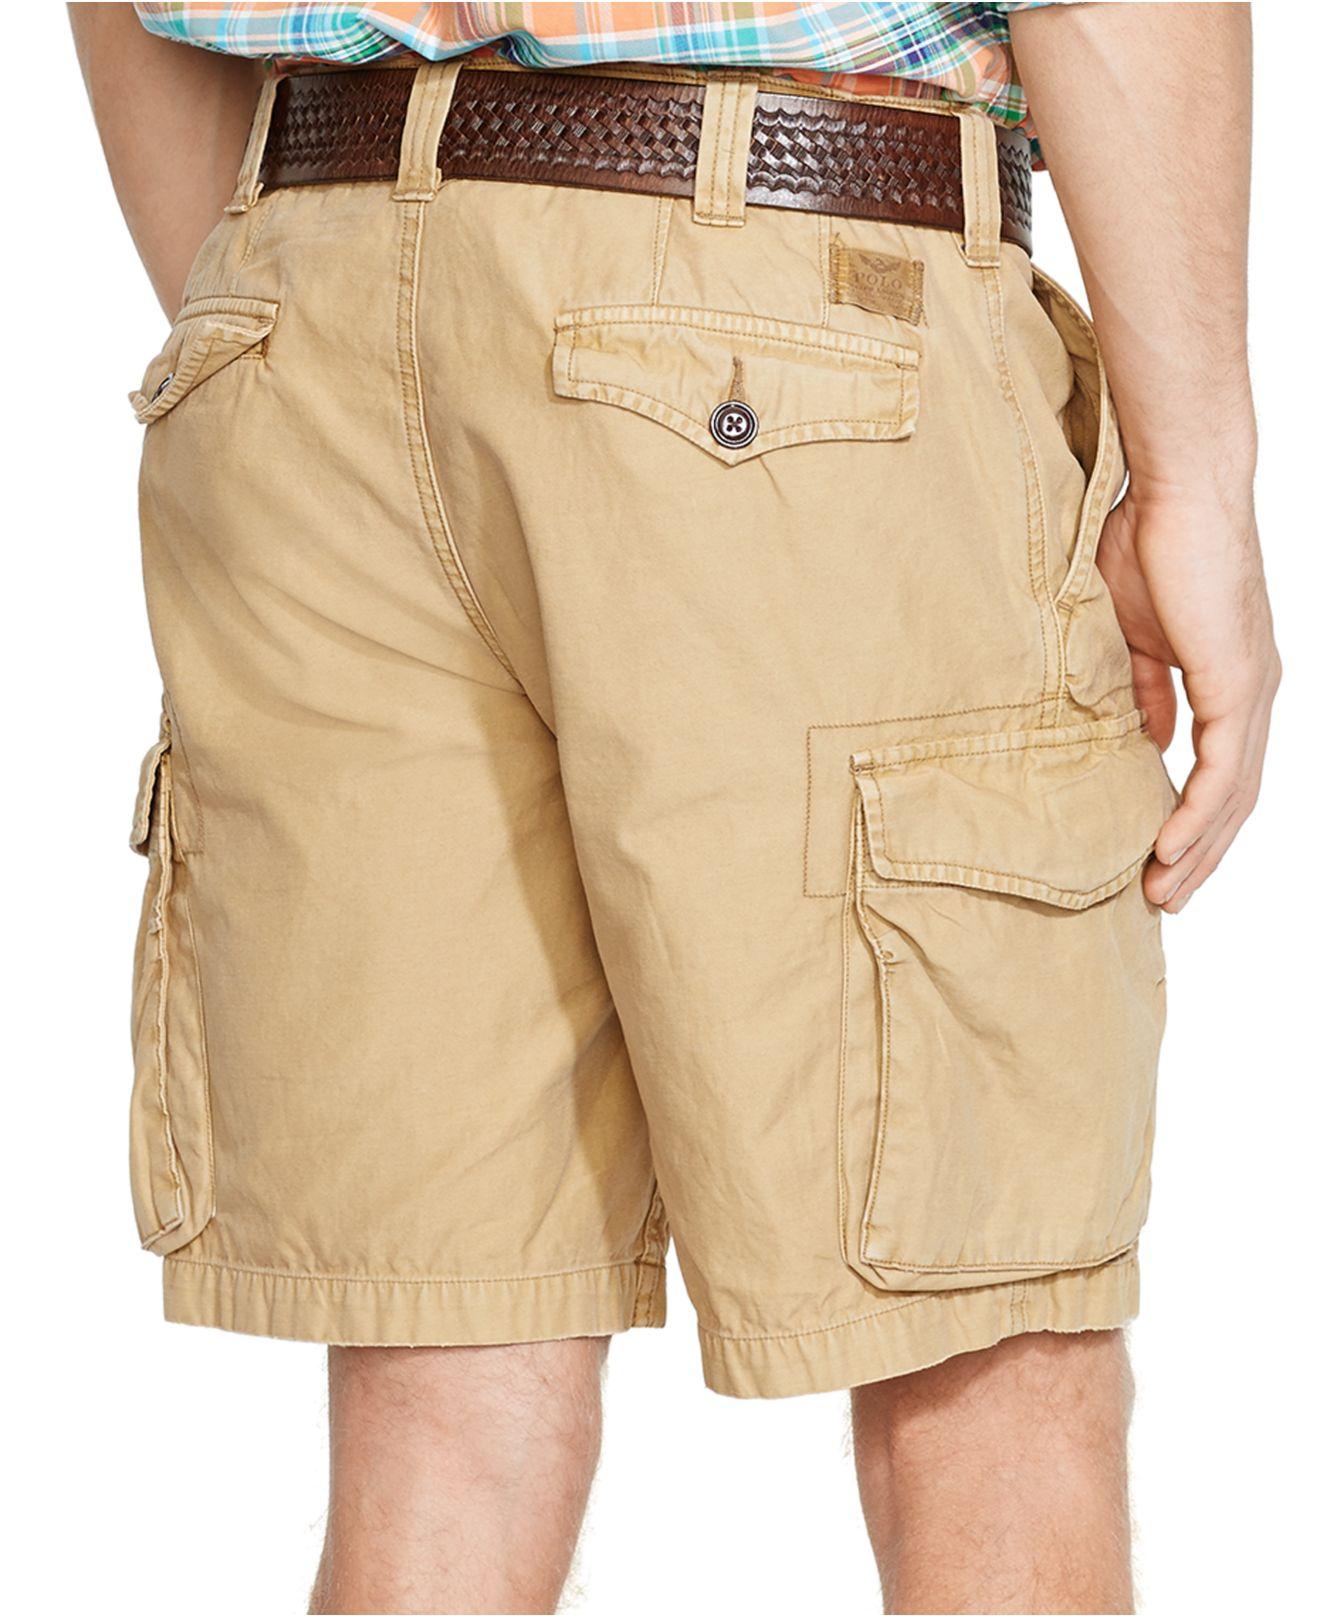 Polo khaki shorts for men